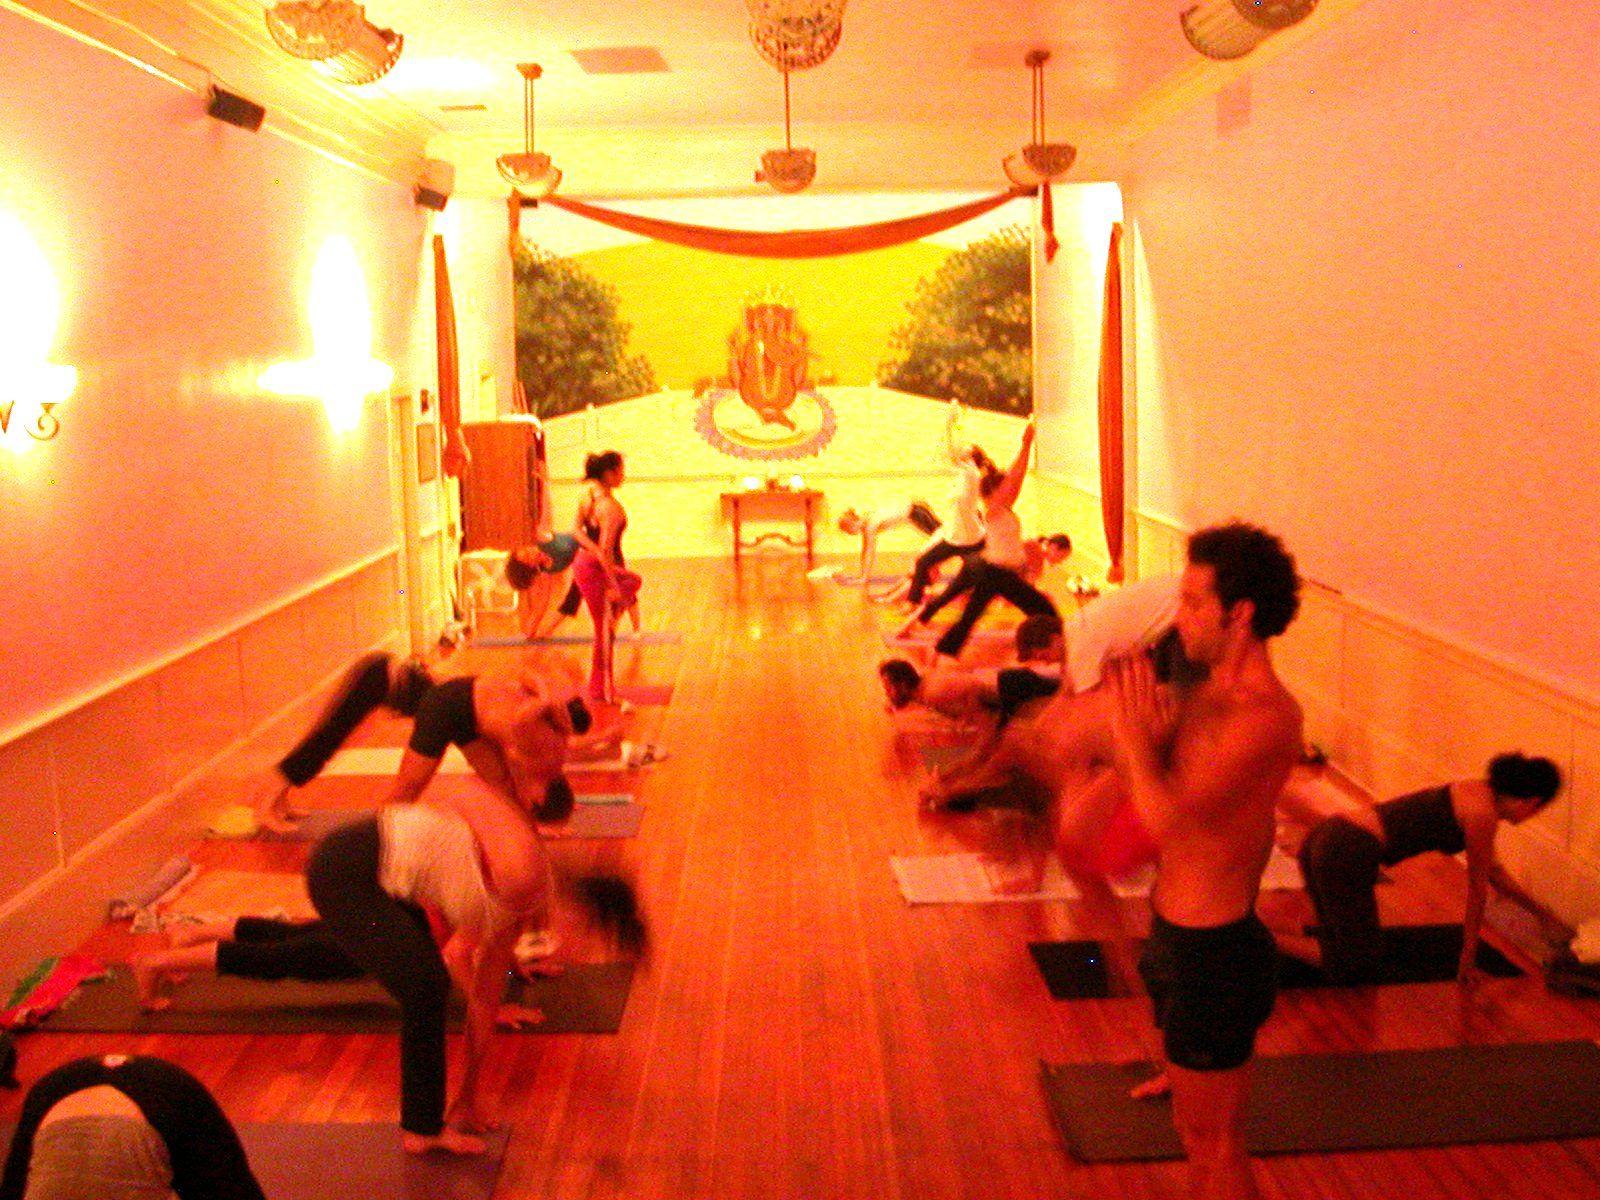 30 Incredible Yoga Studios To Visit This Lifetime Yoga Studio Yoga The Incredibles